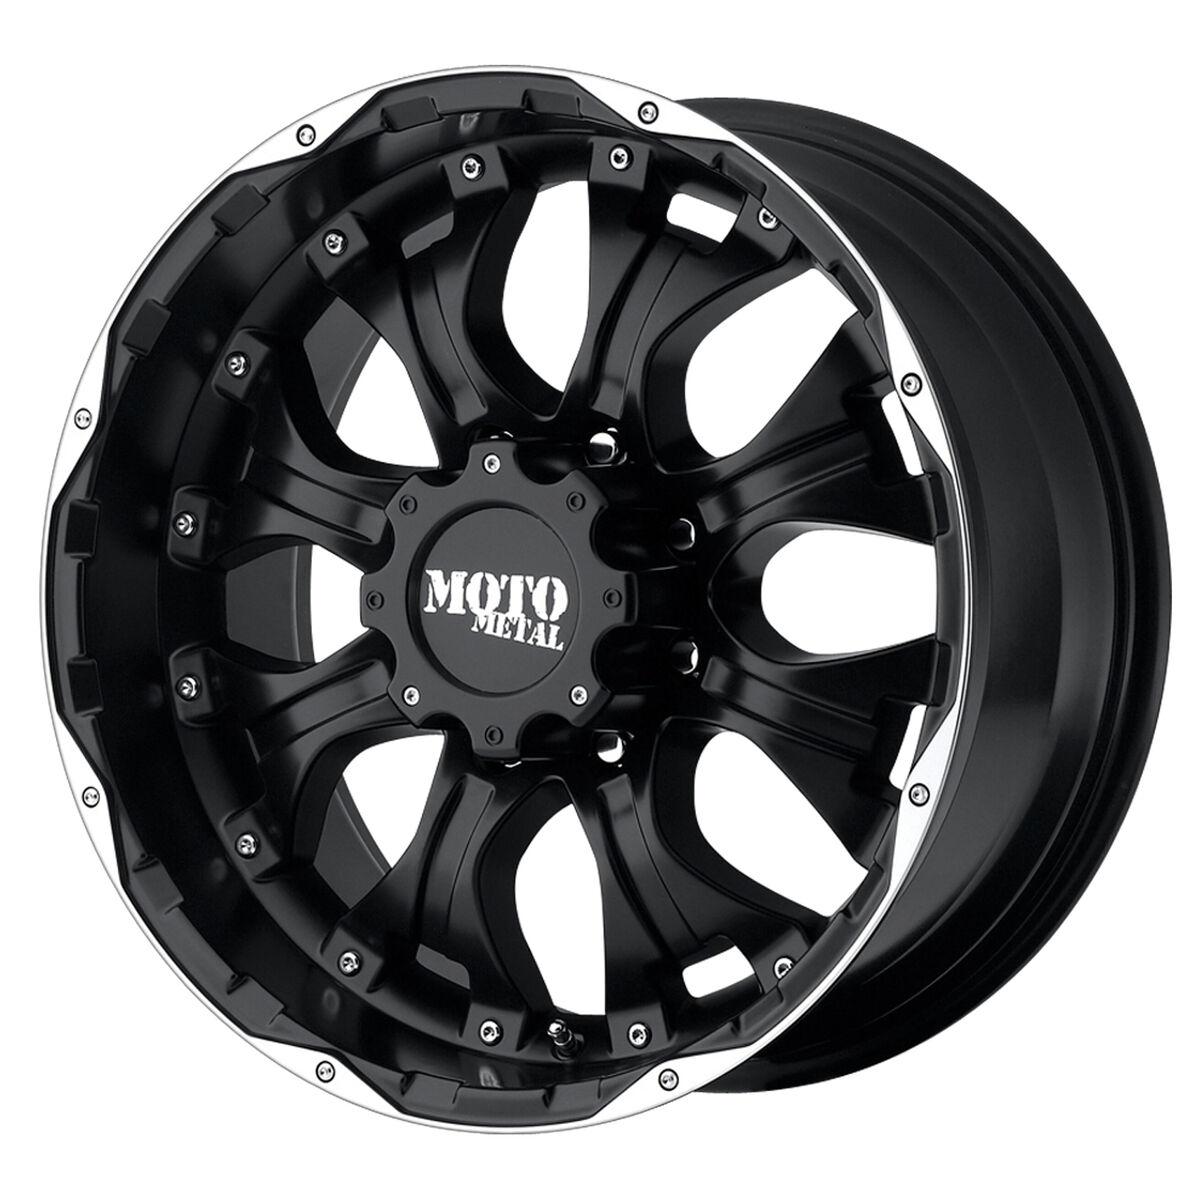 18 inch Black wheels rim MOTO METAL 959 Chevy Gmc Dodge 2500 3500 8